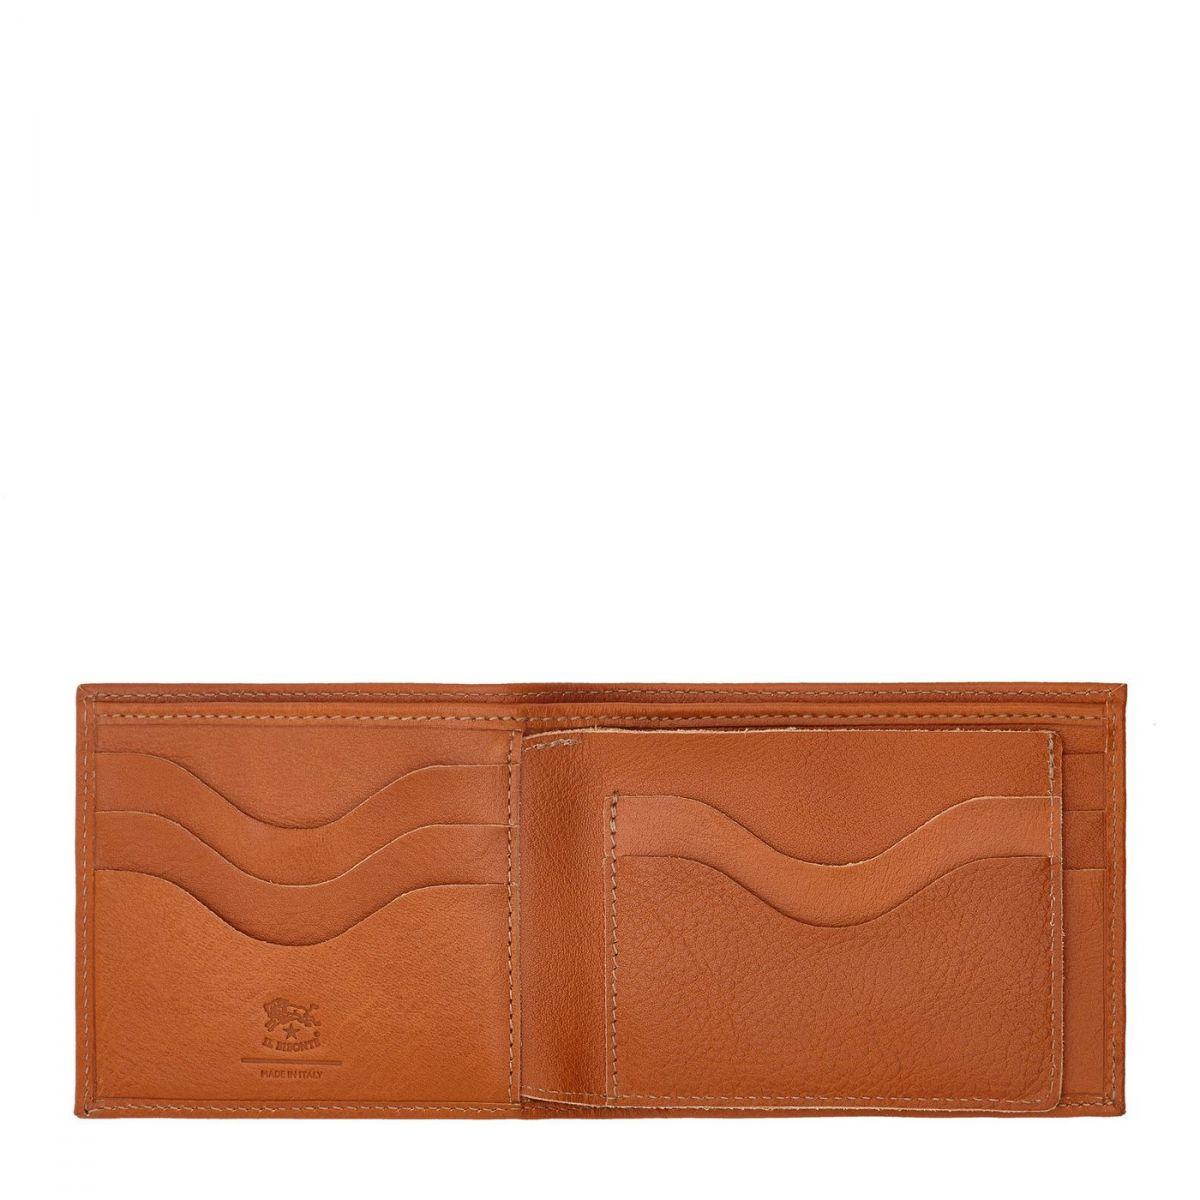 Men's Bi-Fold Wallet  in Cowhide Leather SBW042 color Caramel | Details